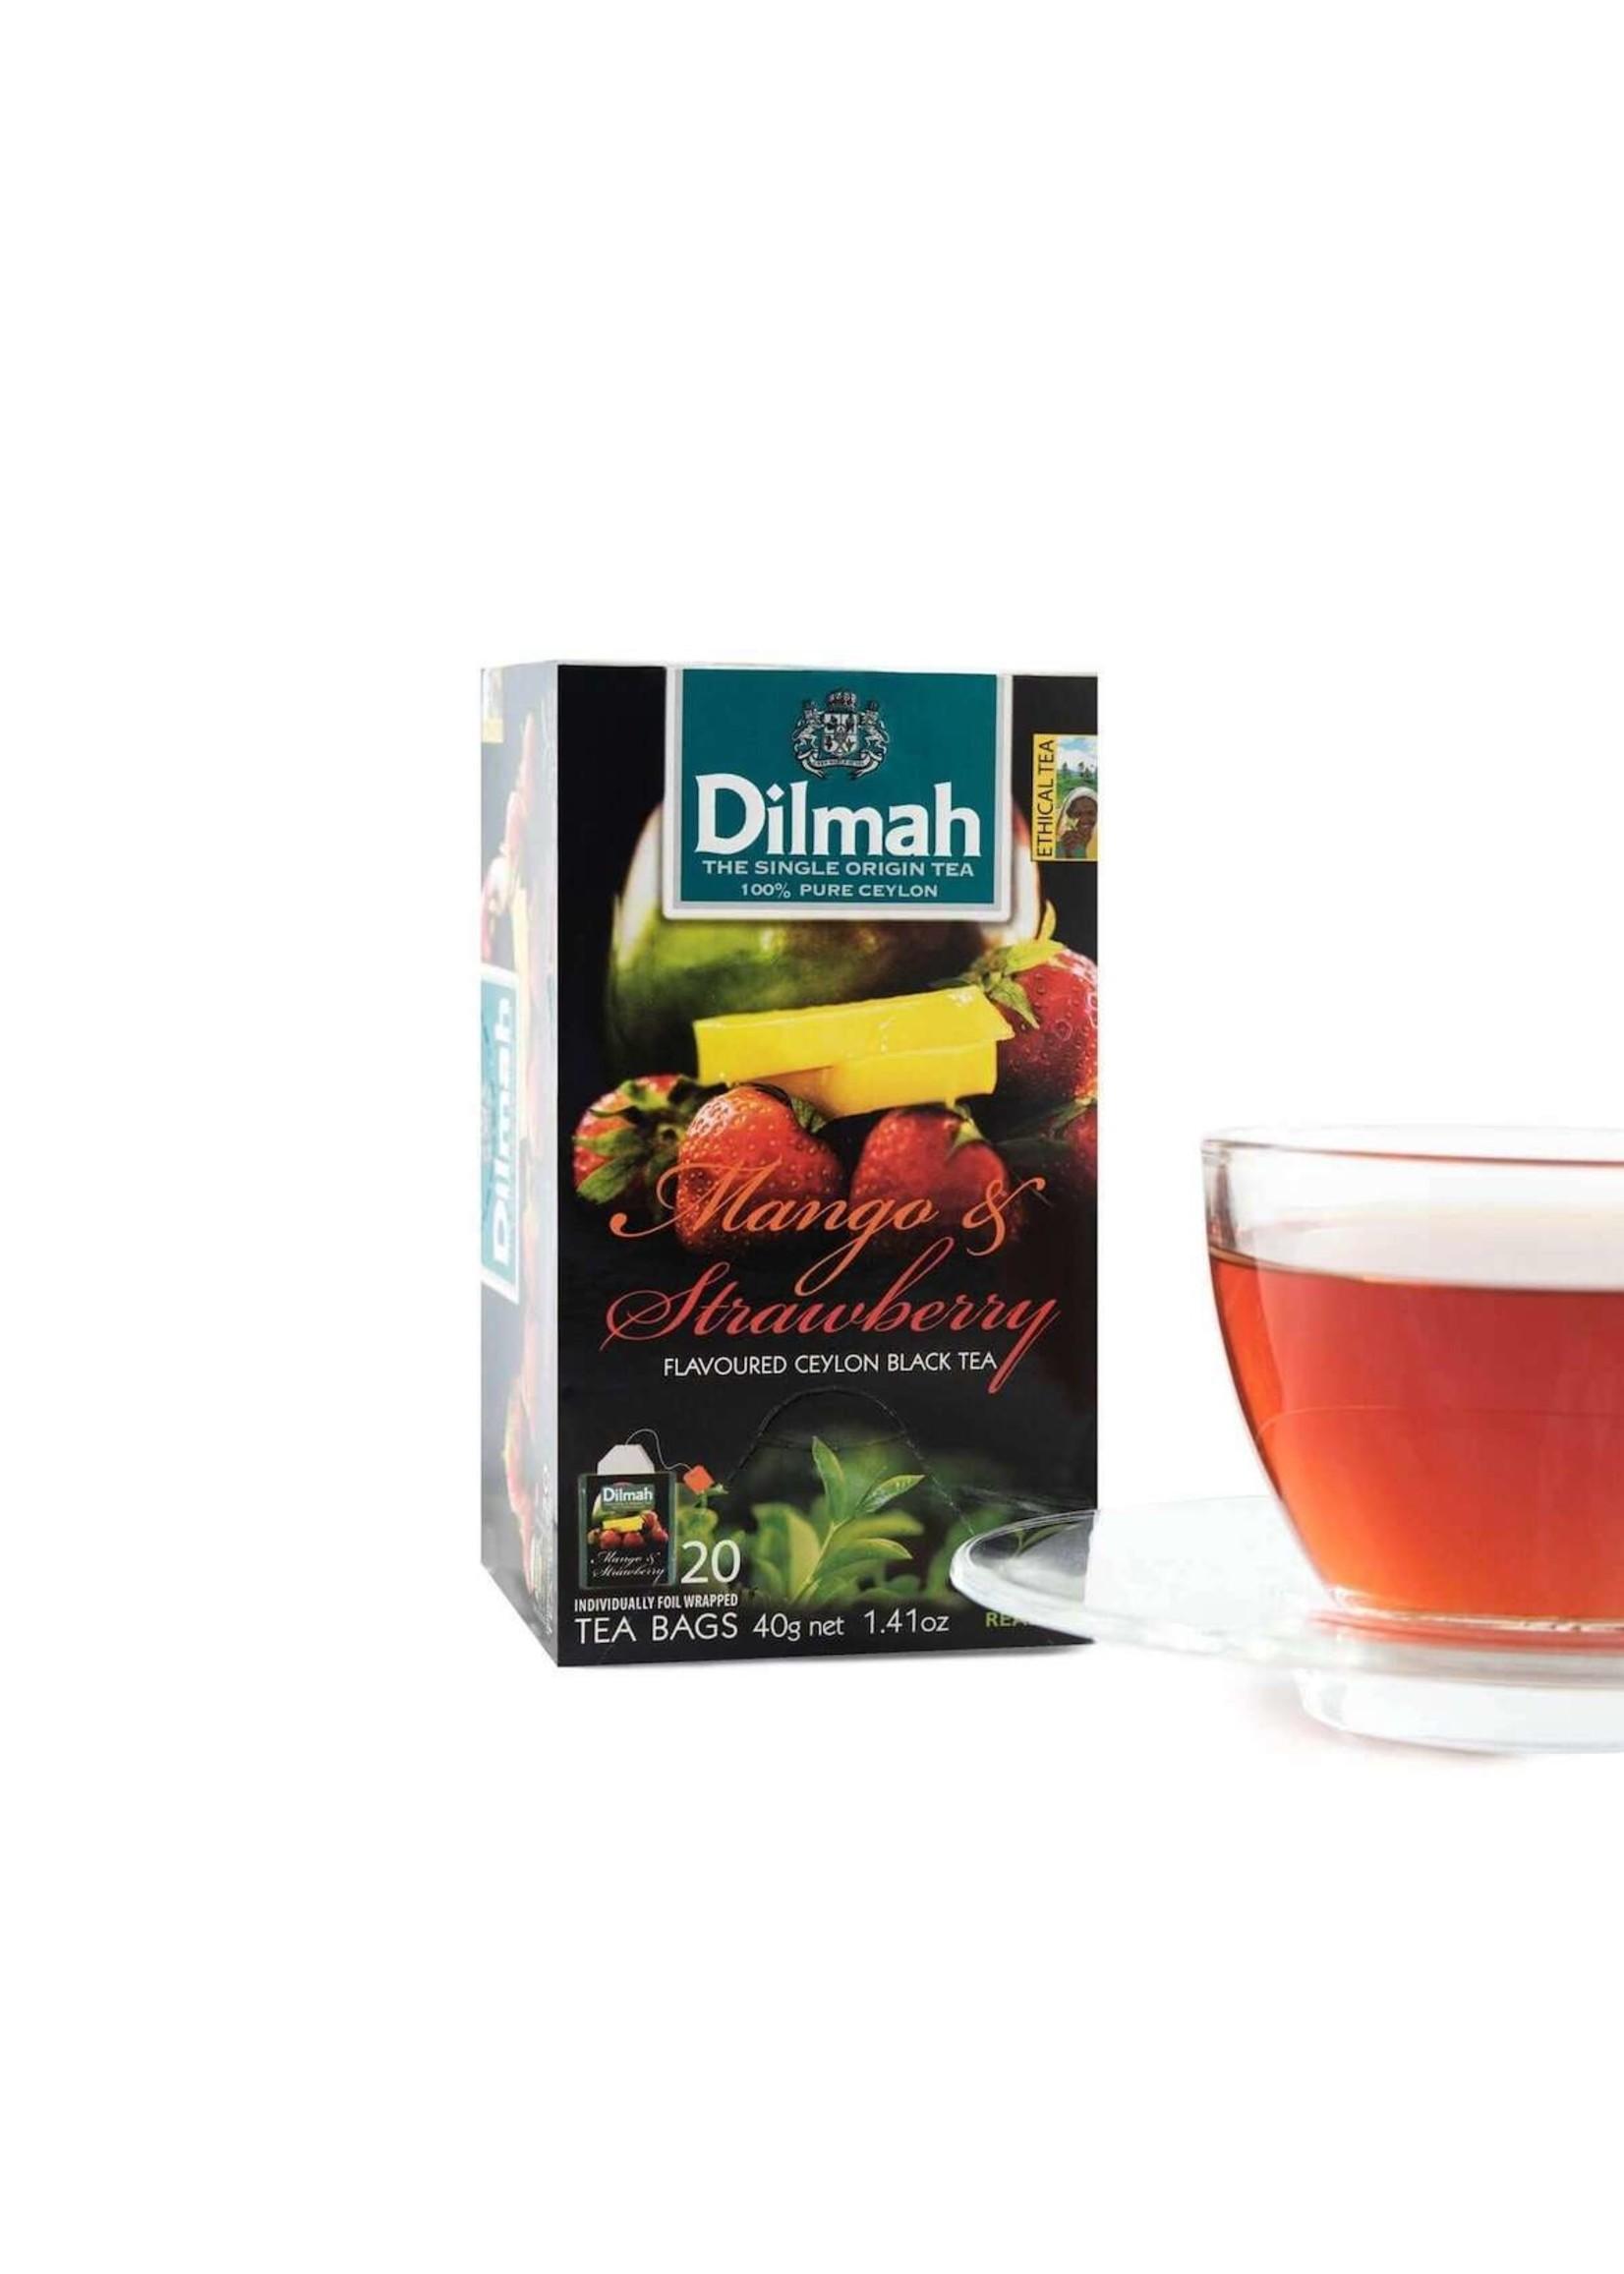 Dilmah Dilmah Mango & Strawberry Flavoured Ceylon Black Tea